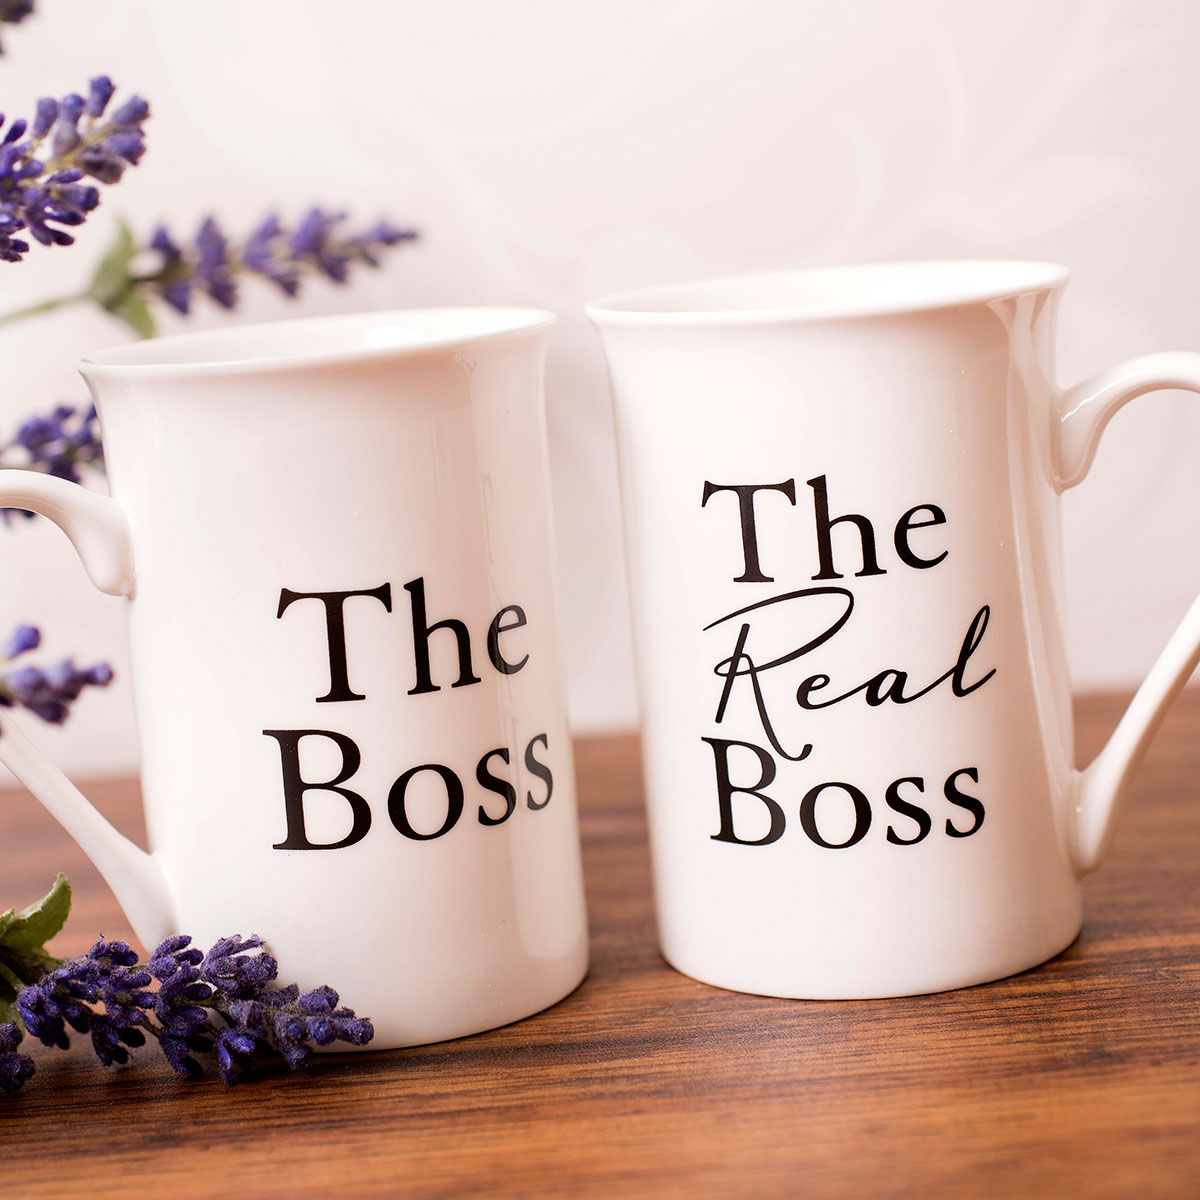 Mug Gift Set The Boss Amp The Real Boss GettingPersonal